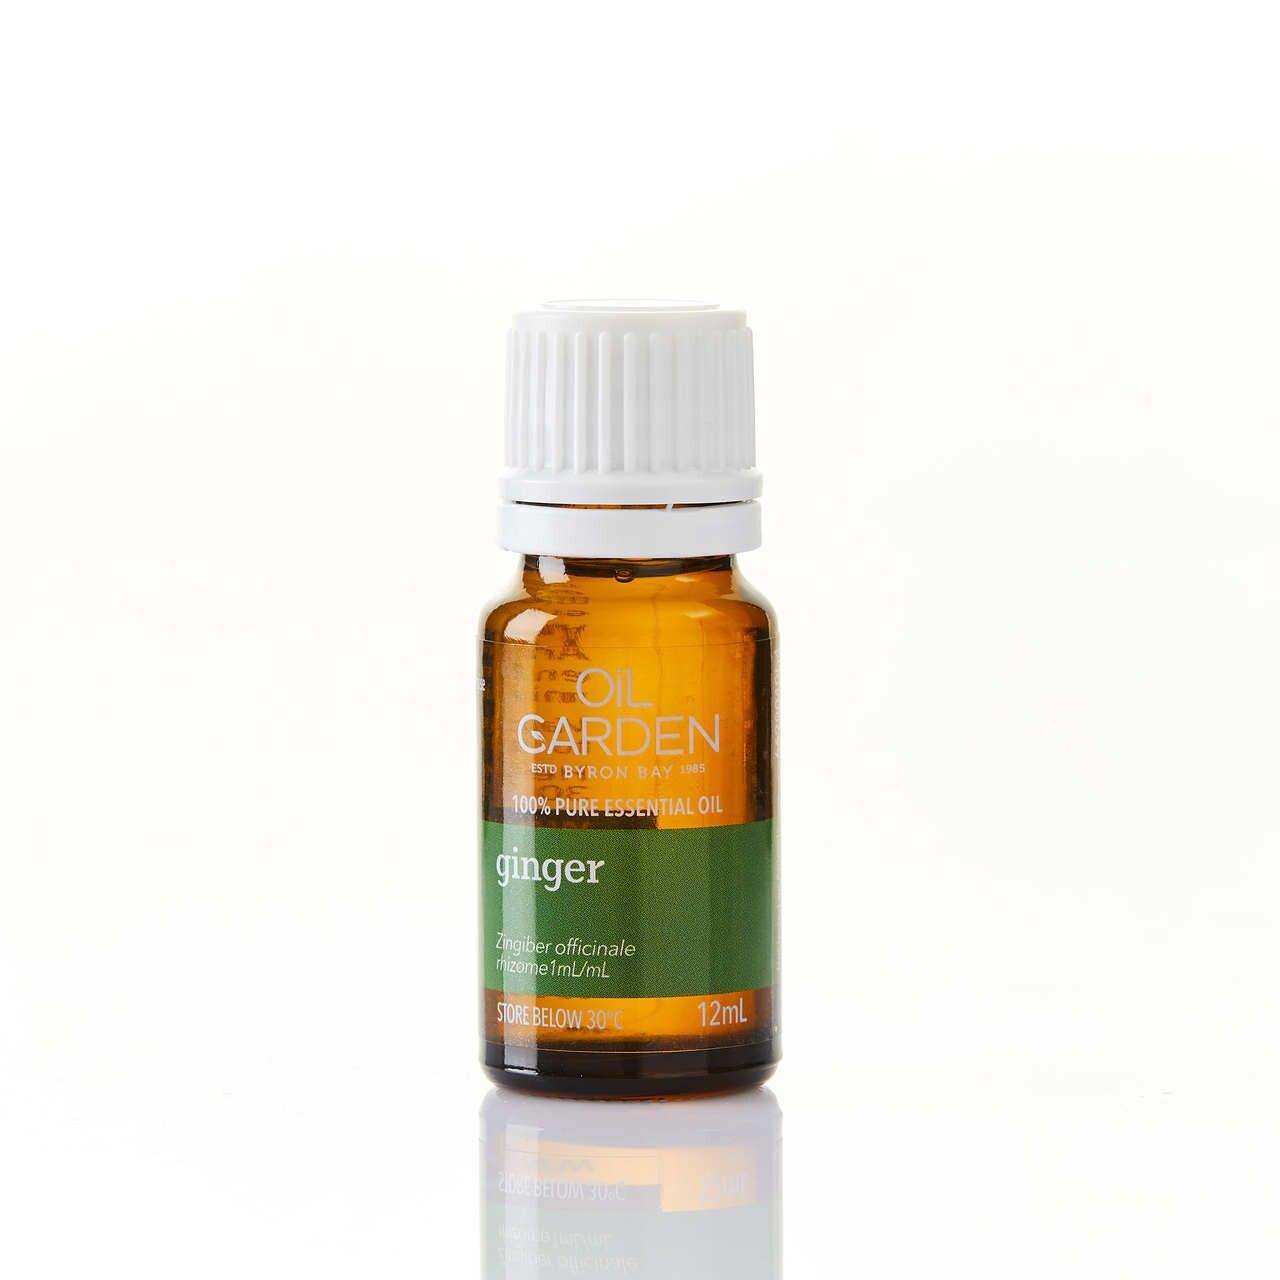 Oil Garden Ginger Pure Essential Oil 12mL 6620040